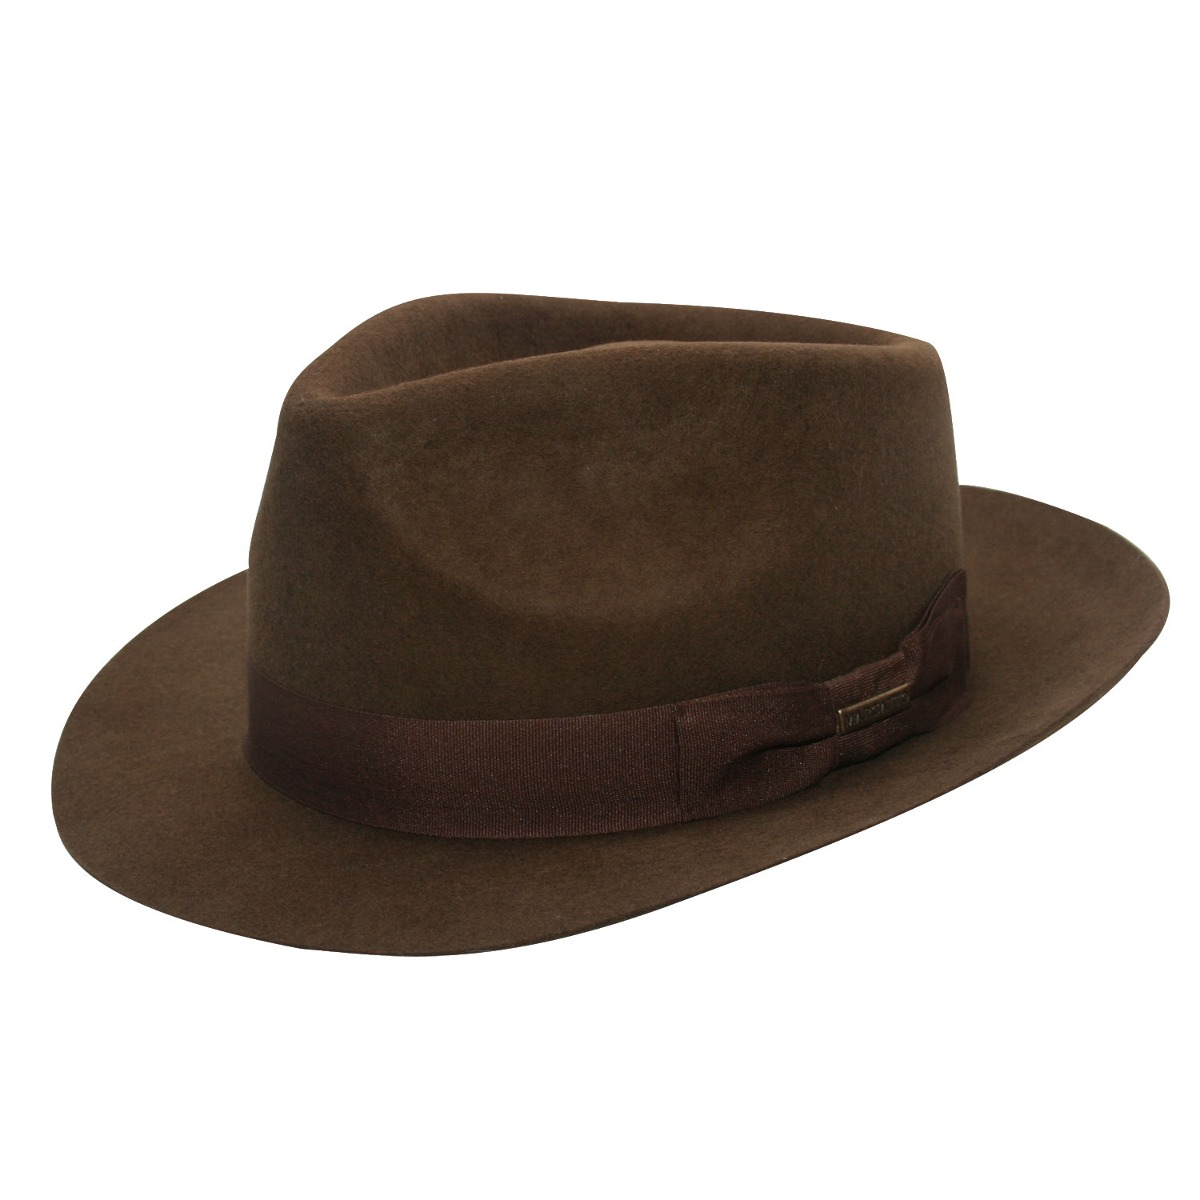 chapéu fedora masculino estilo gangster marrom feltro. Carregando zoom. 56e13588066